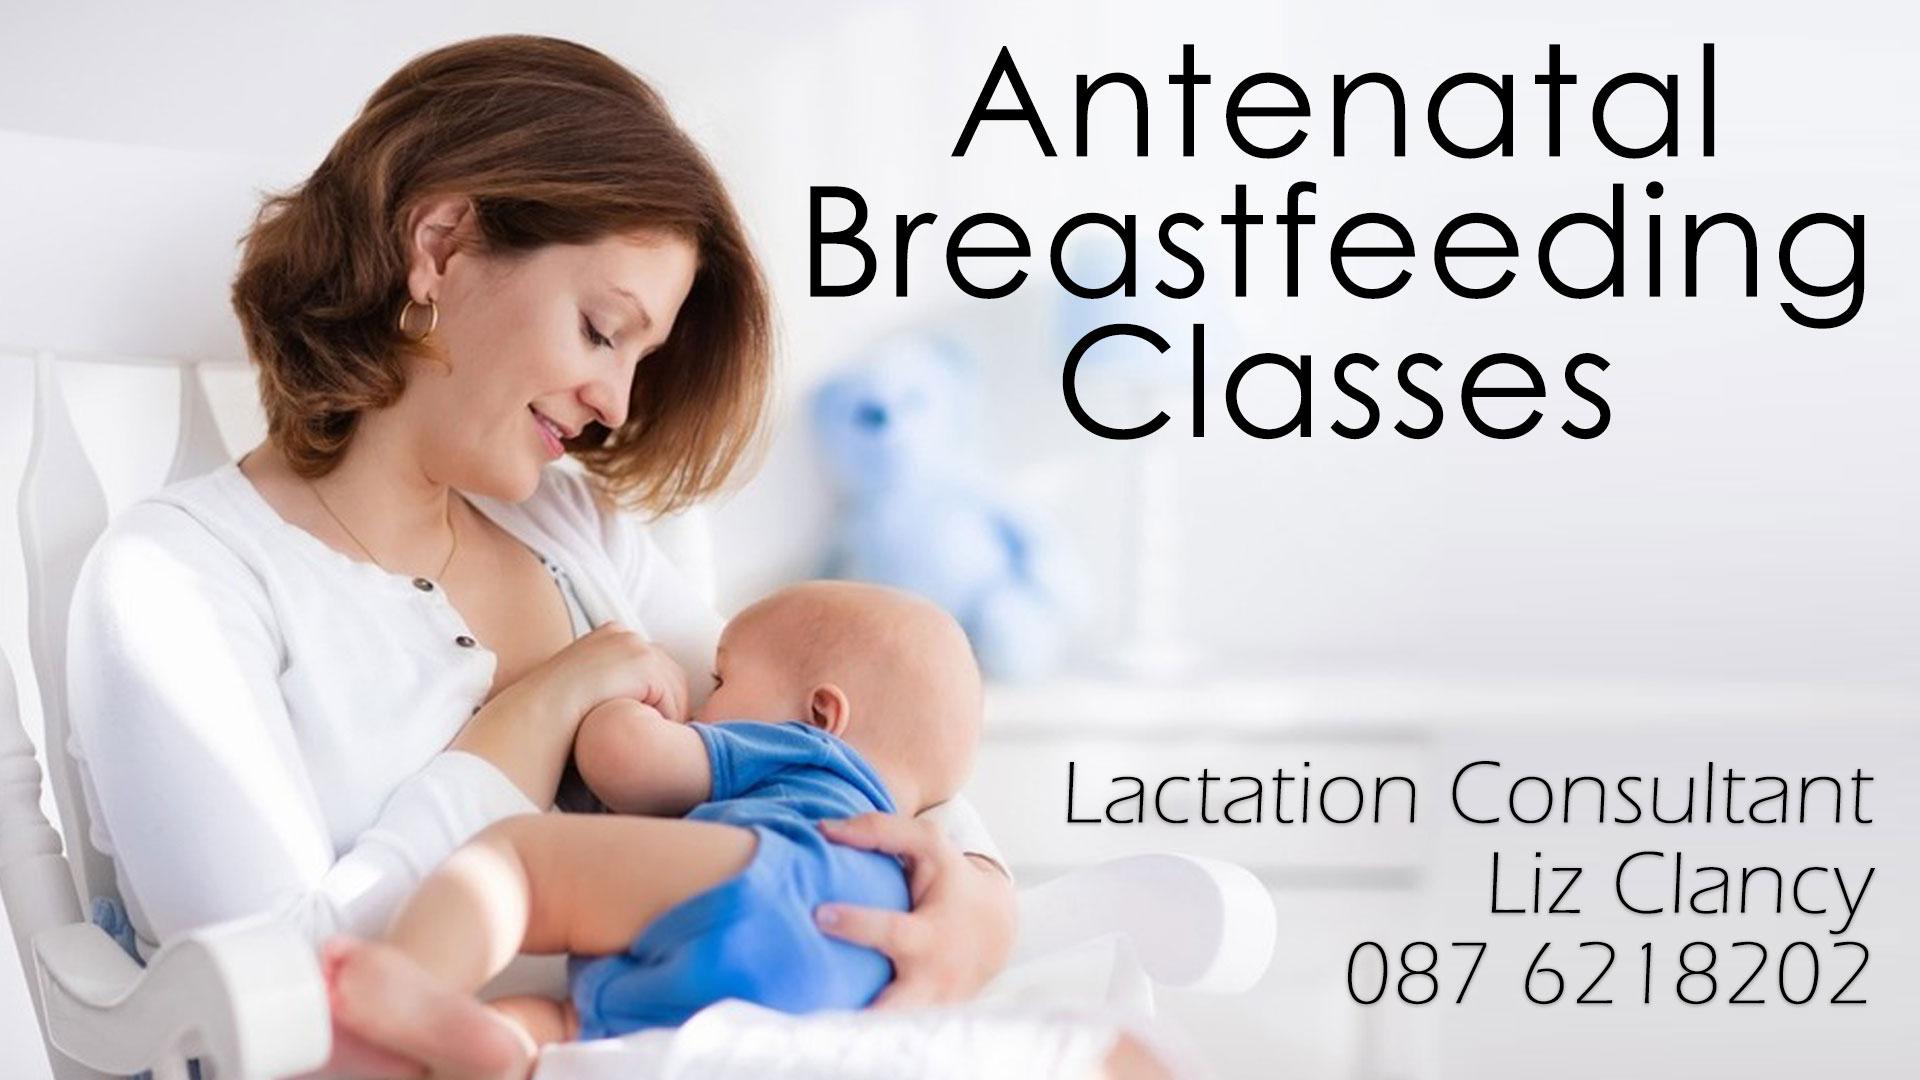 Antenatal Breastfeeding Classes